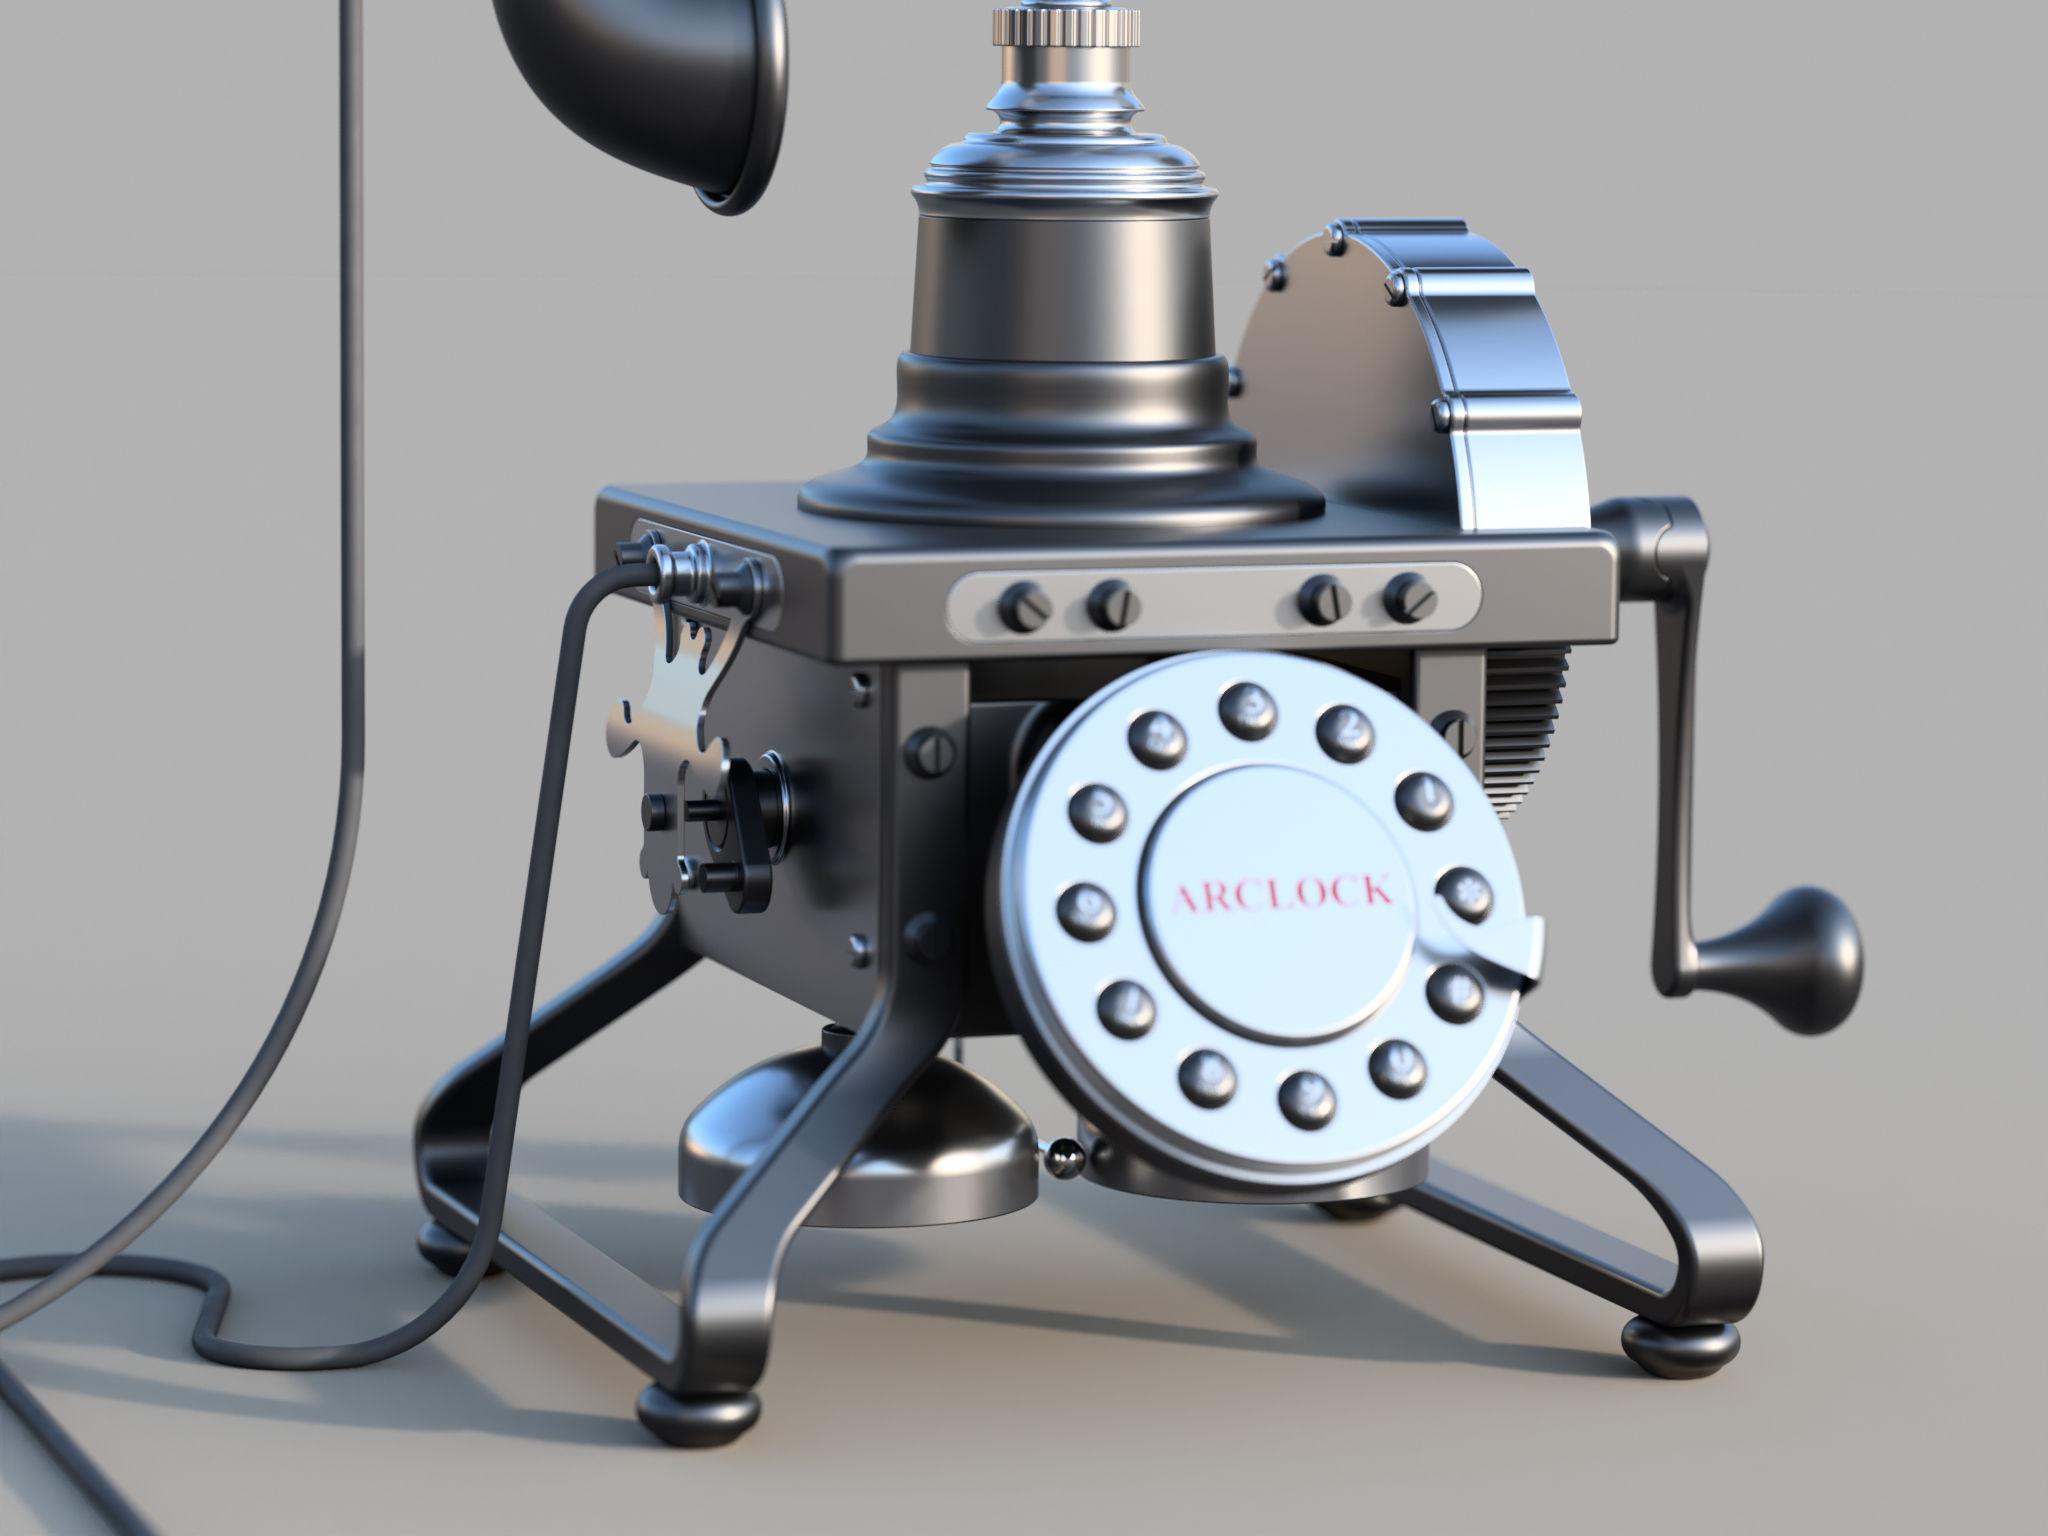 Arclock-phone-2017-jan-05-05-23-01am-000-customizedview21947167378-3500-3500